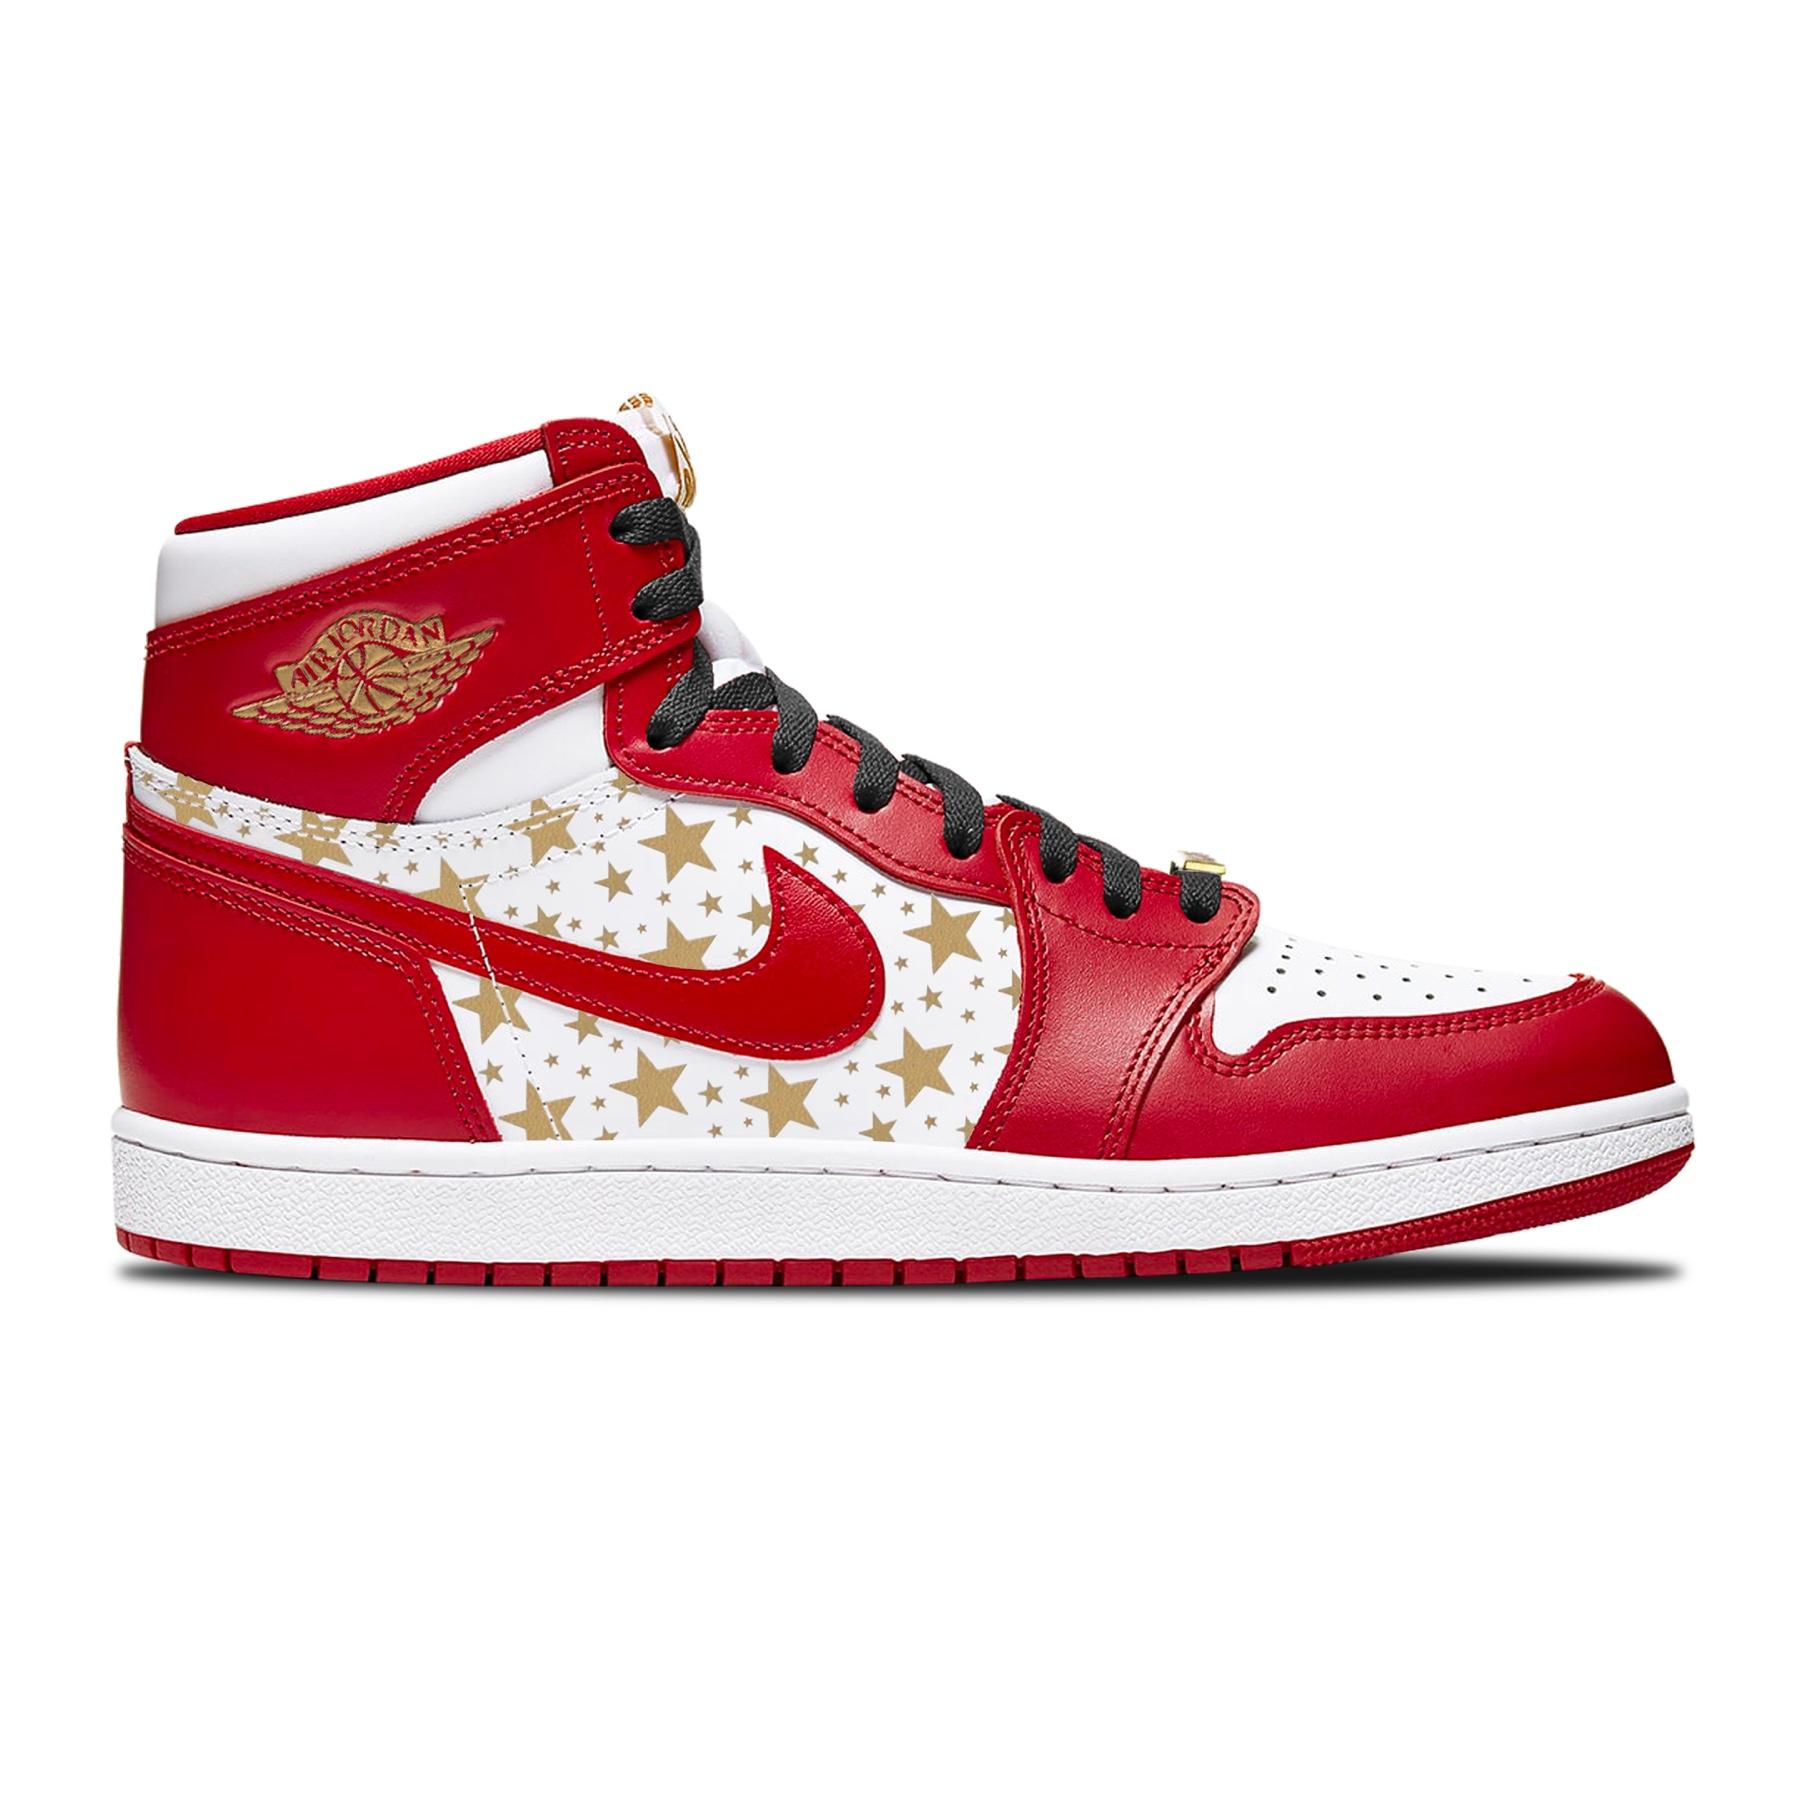 Supreme x Air Jordan 1 High rossa pattern stellato